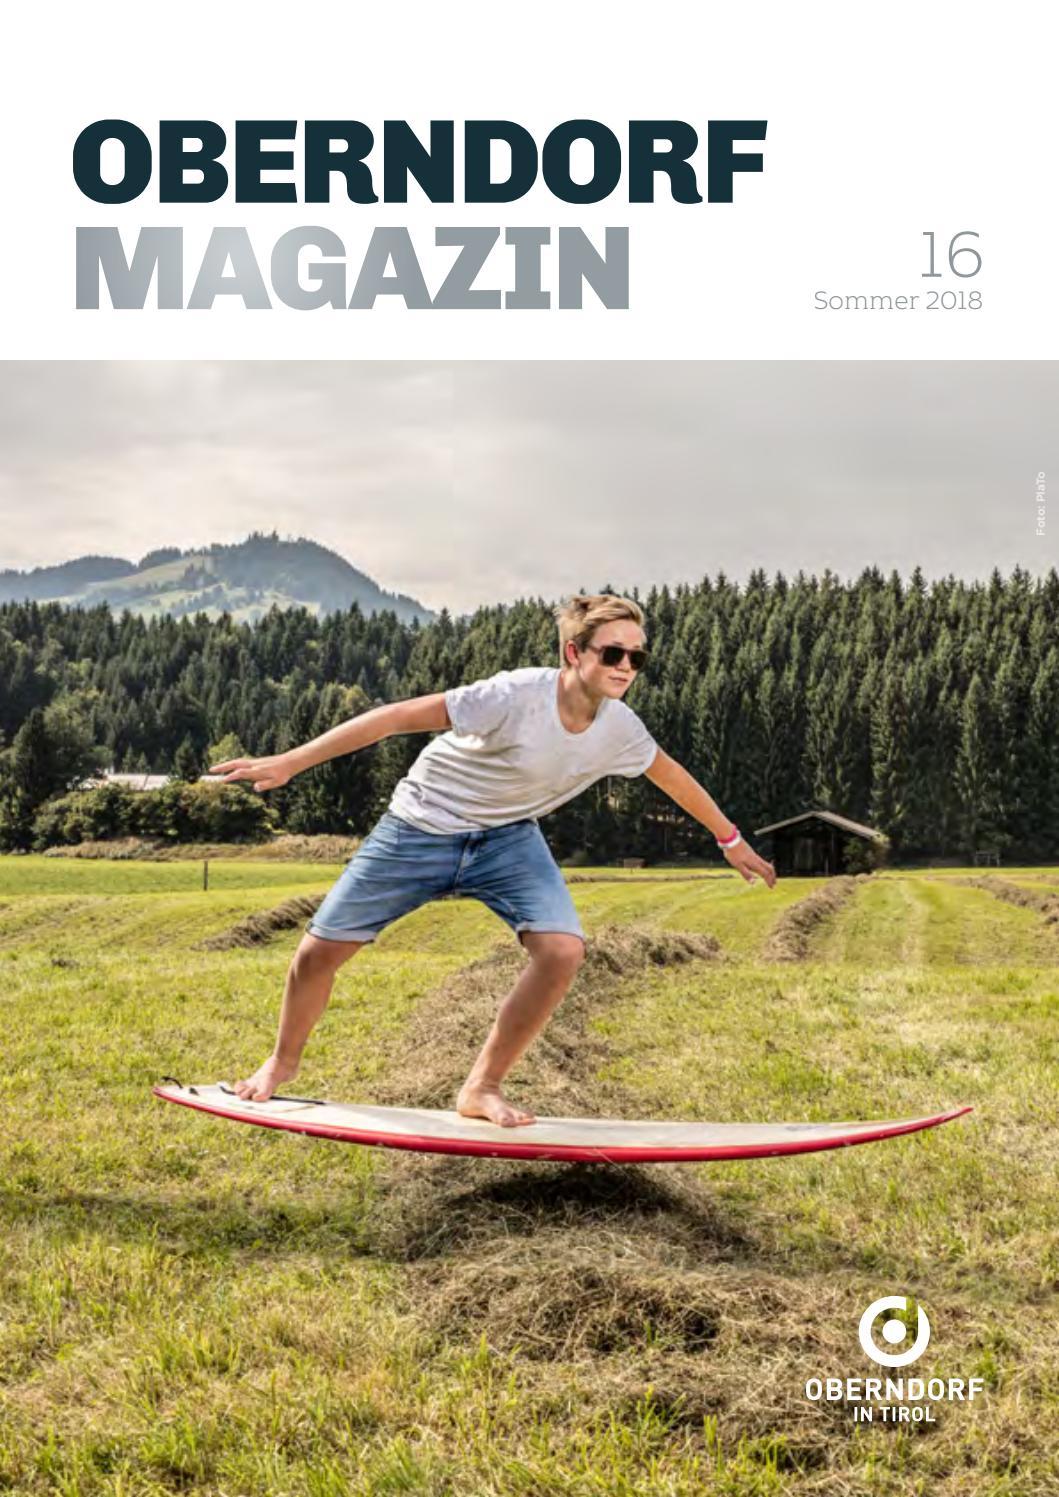 Oberndorf Magazin Nr. 16 – Sommer 2018 by Stefan Feiner - issuu